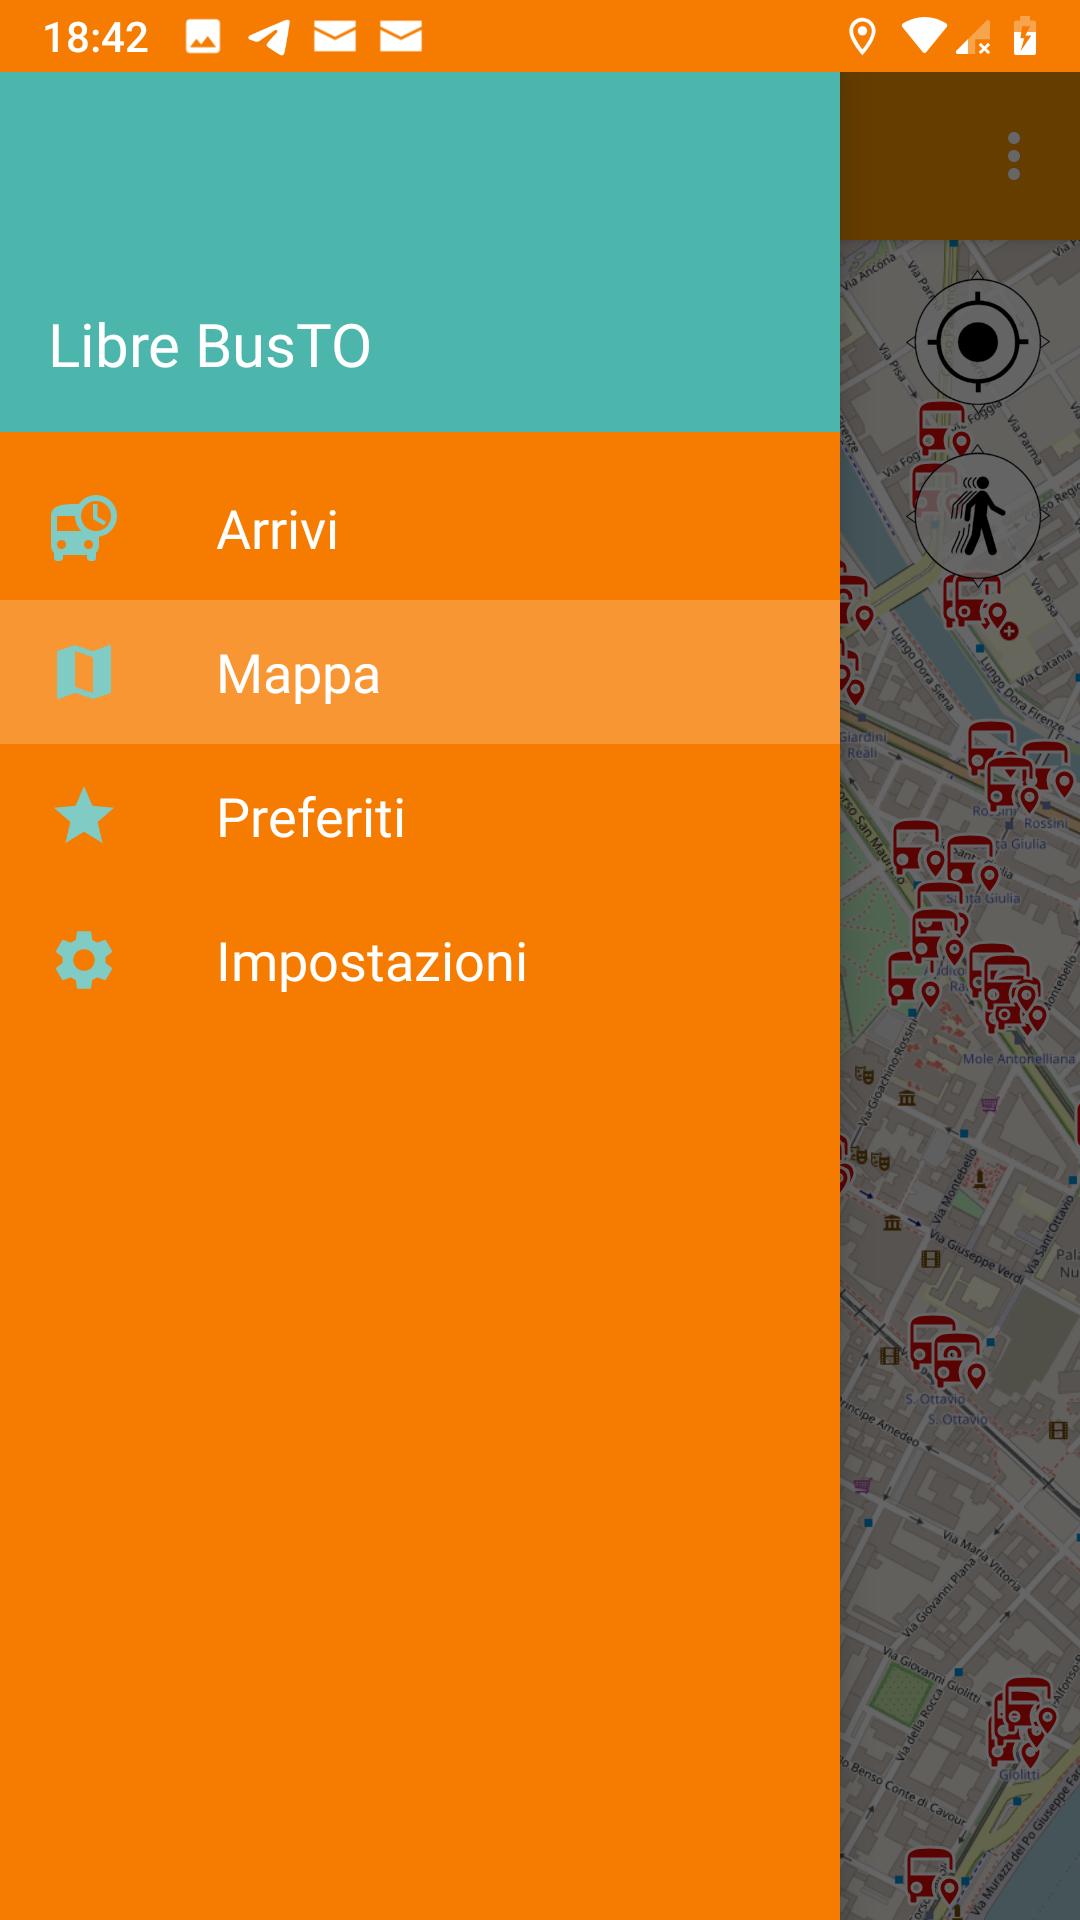 Screenshot_20210608-184240_Trebuchet.png (1×1 px, 465 KB)